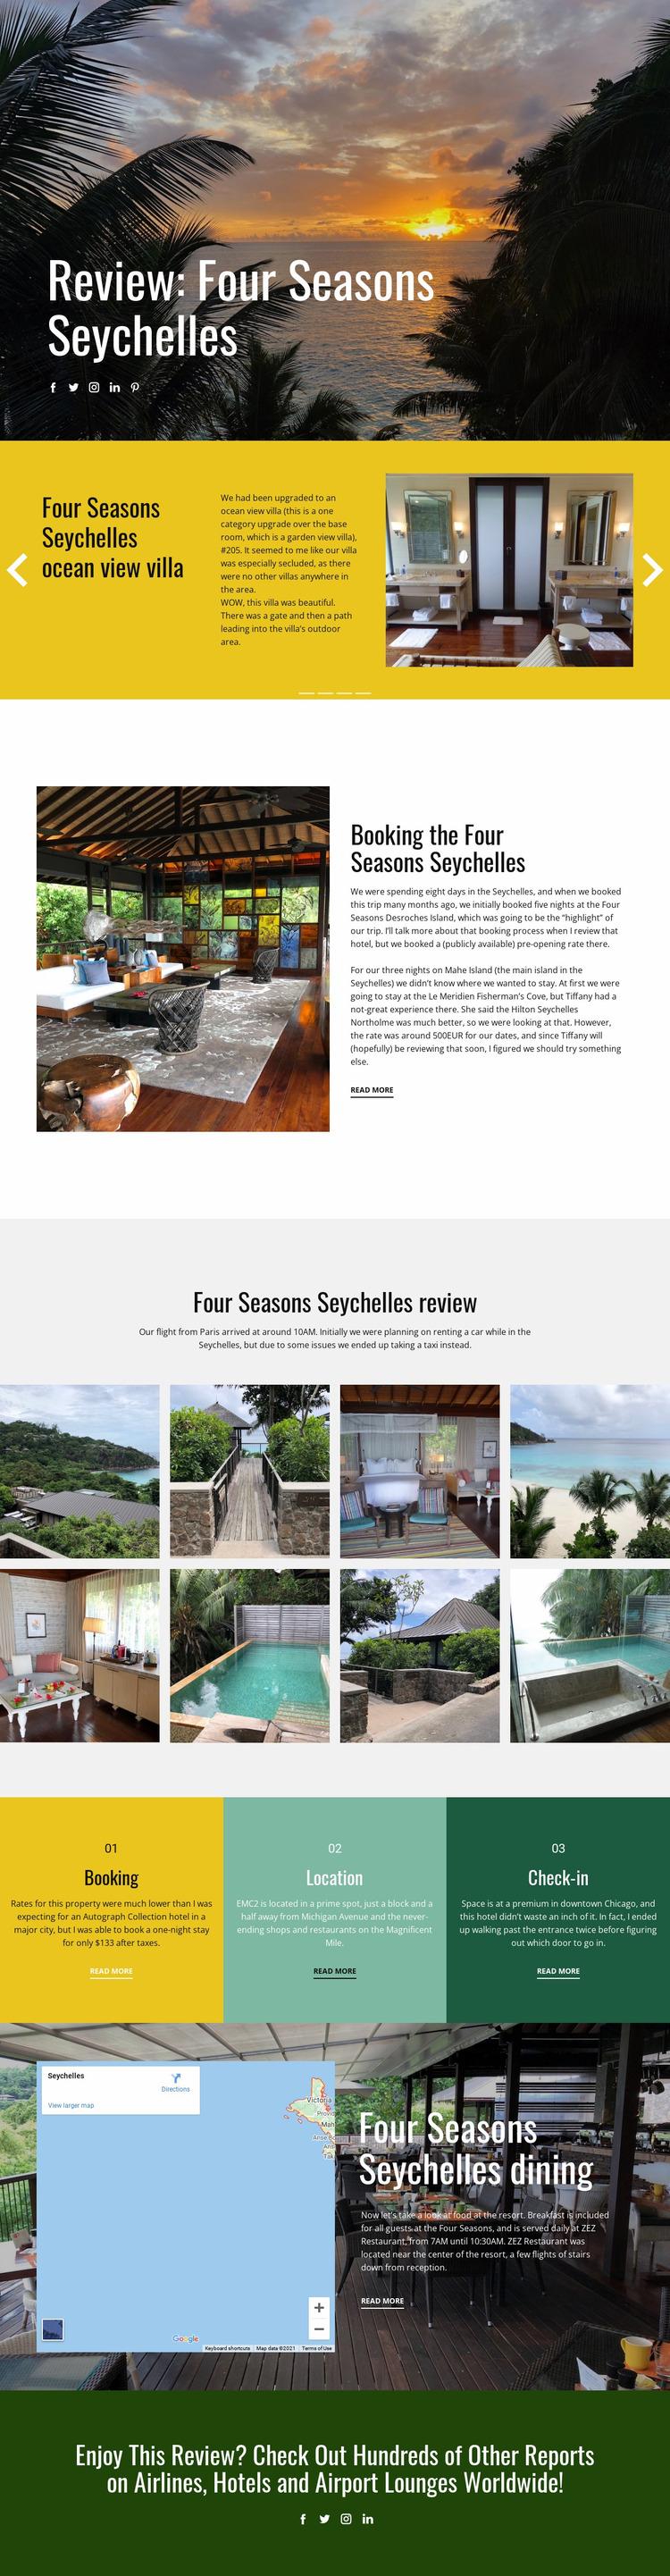 Four Seasons Website Mockup